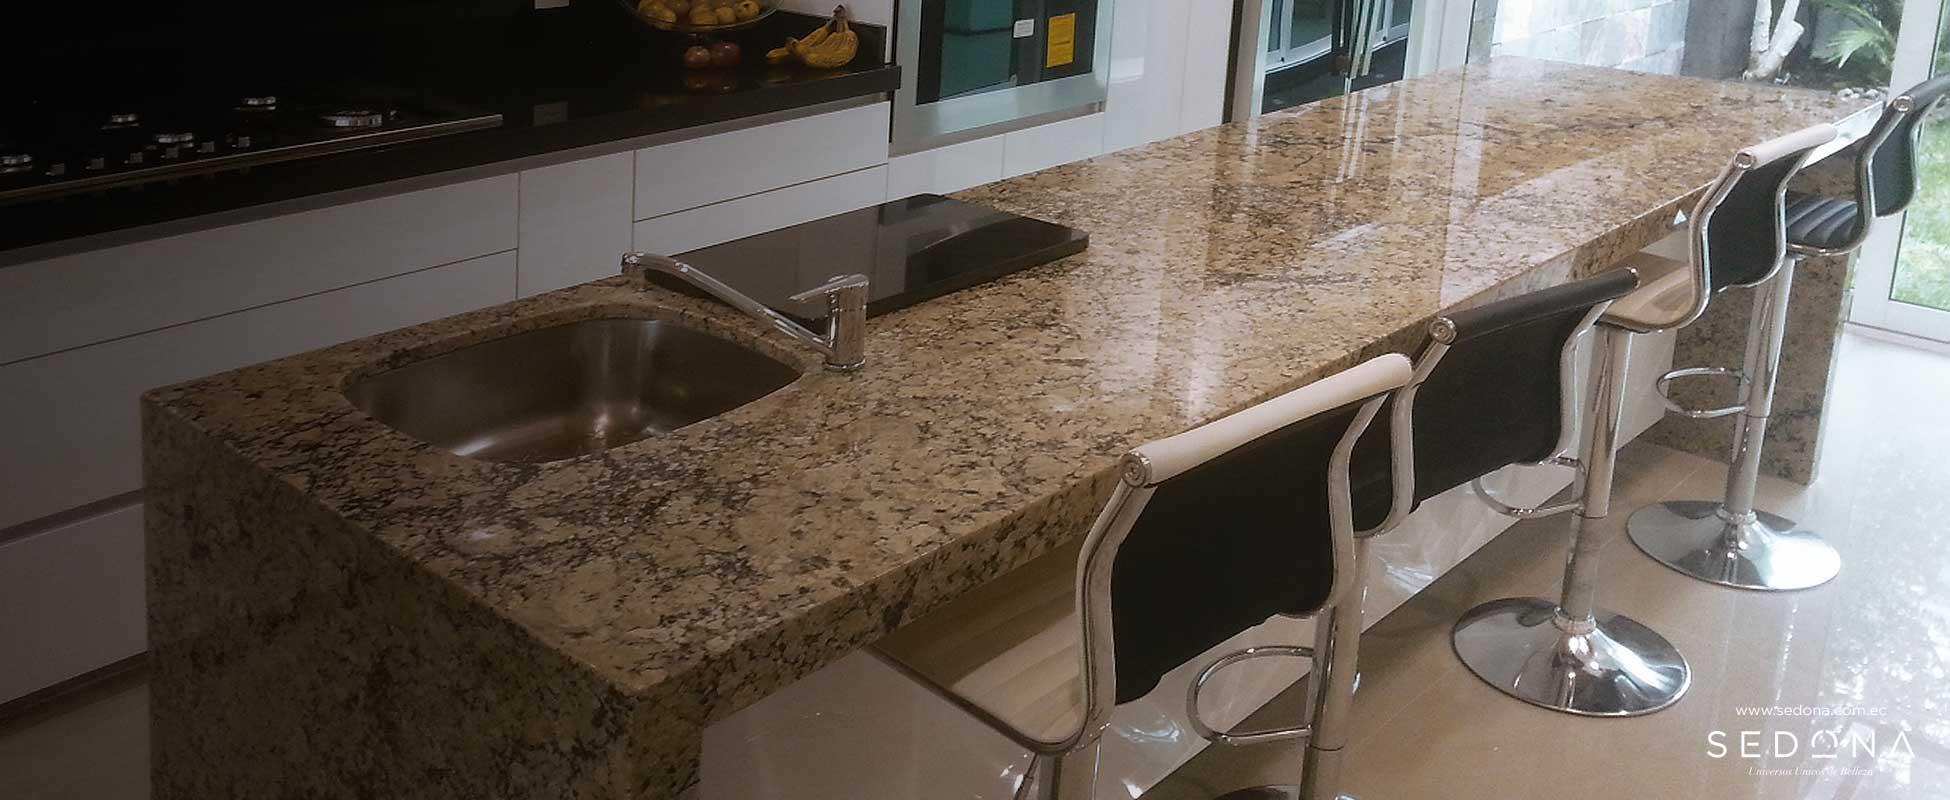 Sedona granitos ecuador granito cuarzo marmol travertino for Barra de granito para cocina precio